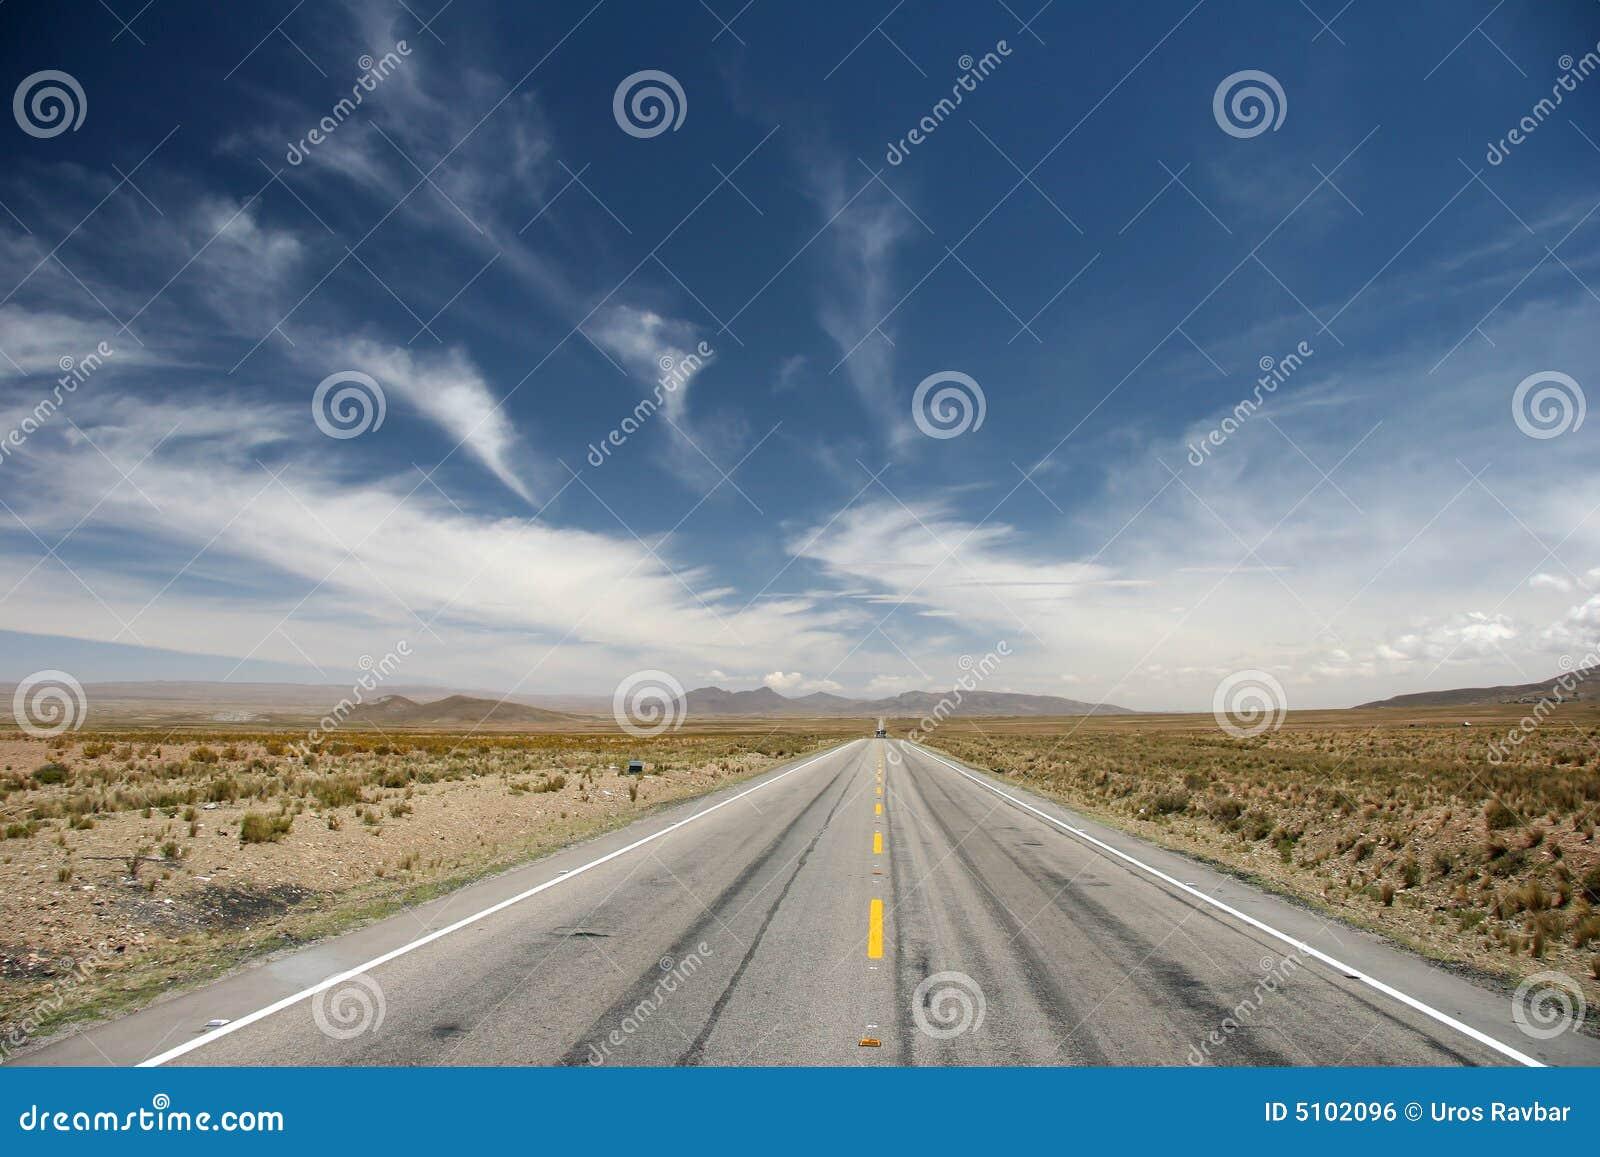 Altiplano road